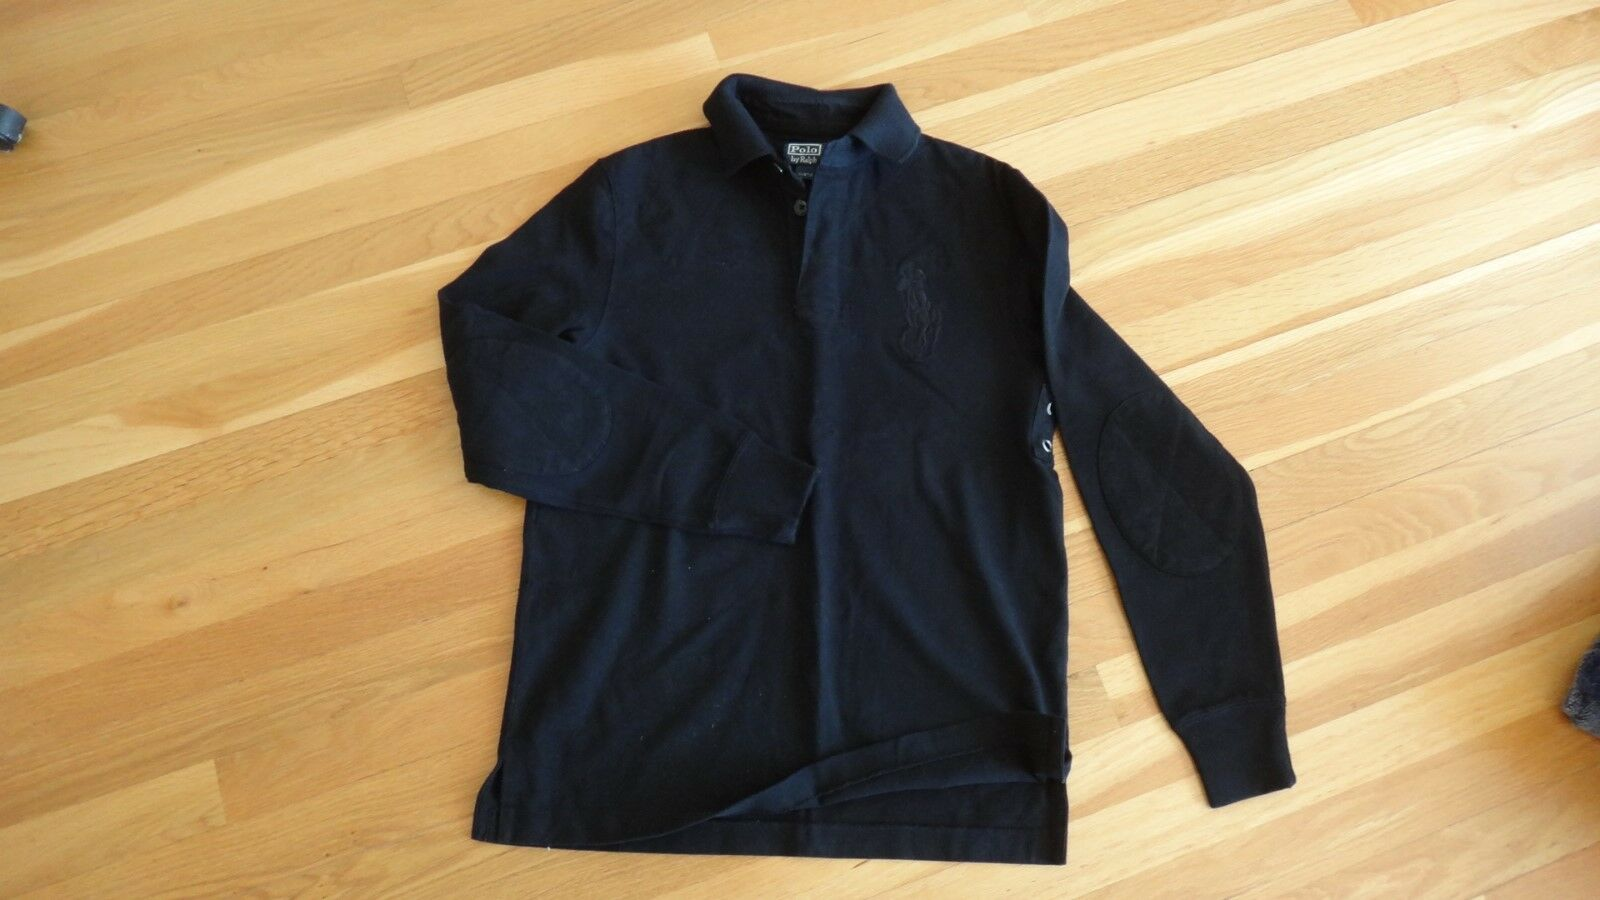 Polo Ralph Lauren Long Sleeves Pullover T-Shirt - Größe S - Brand New